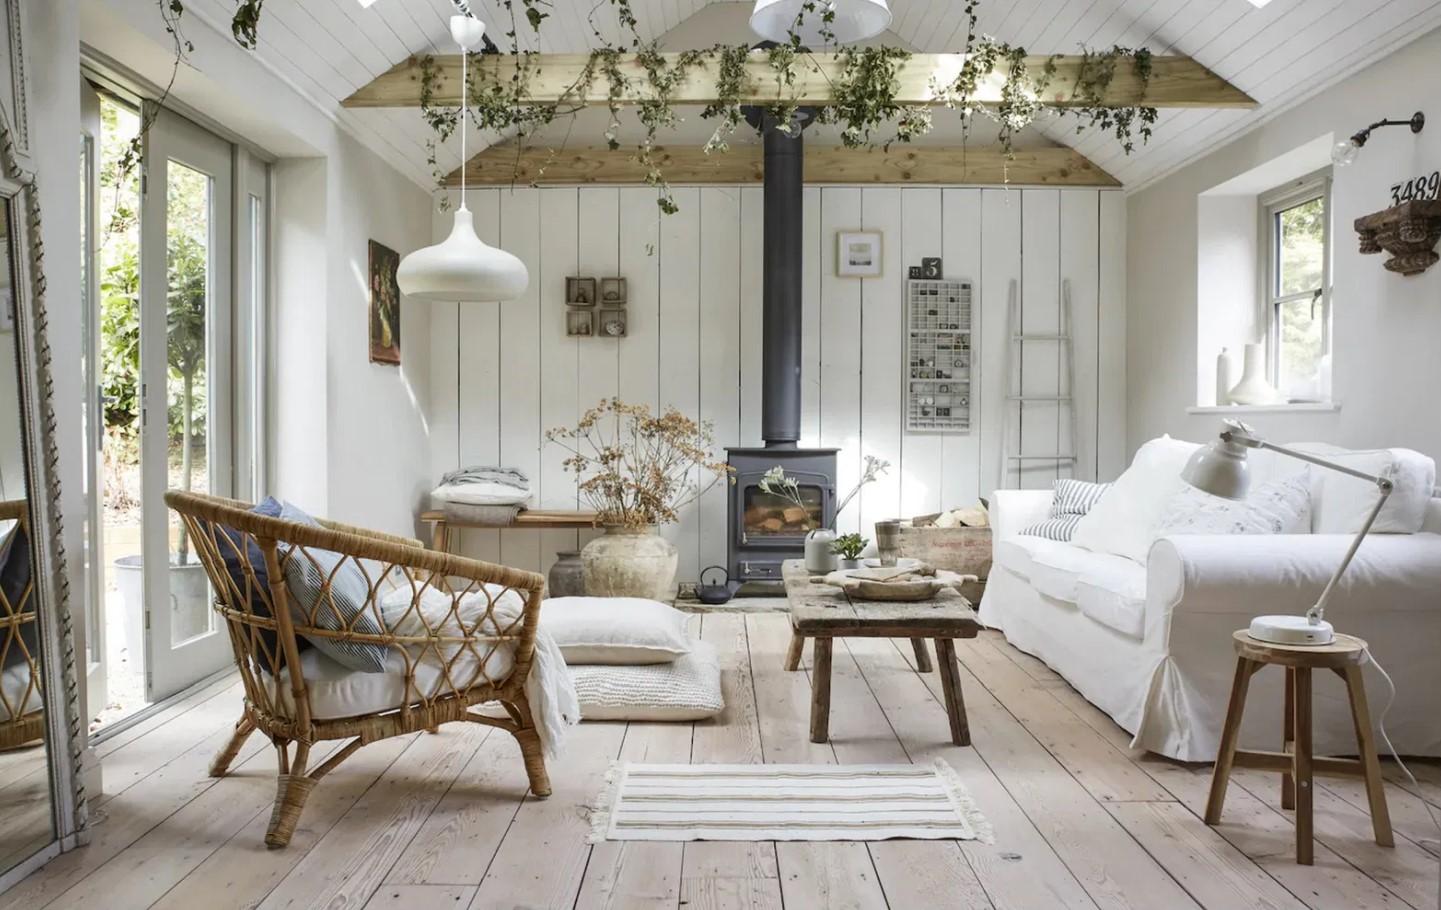 Ektorp sofa in a rustic inspired living room